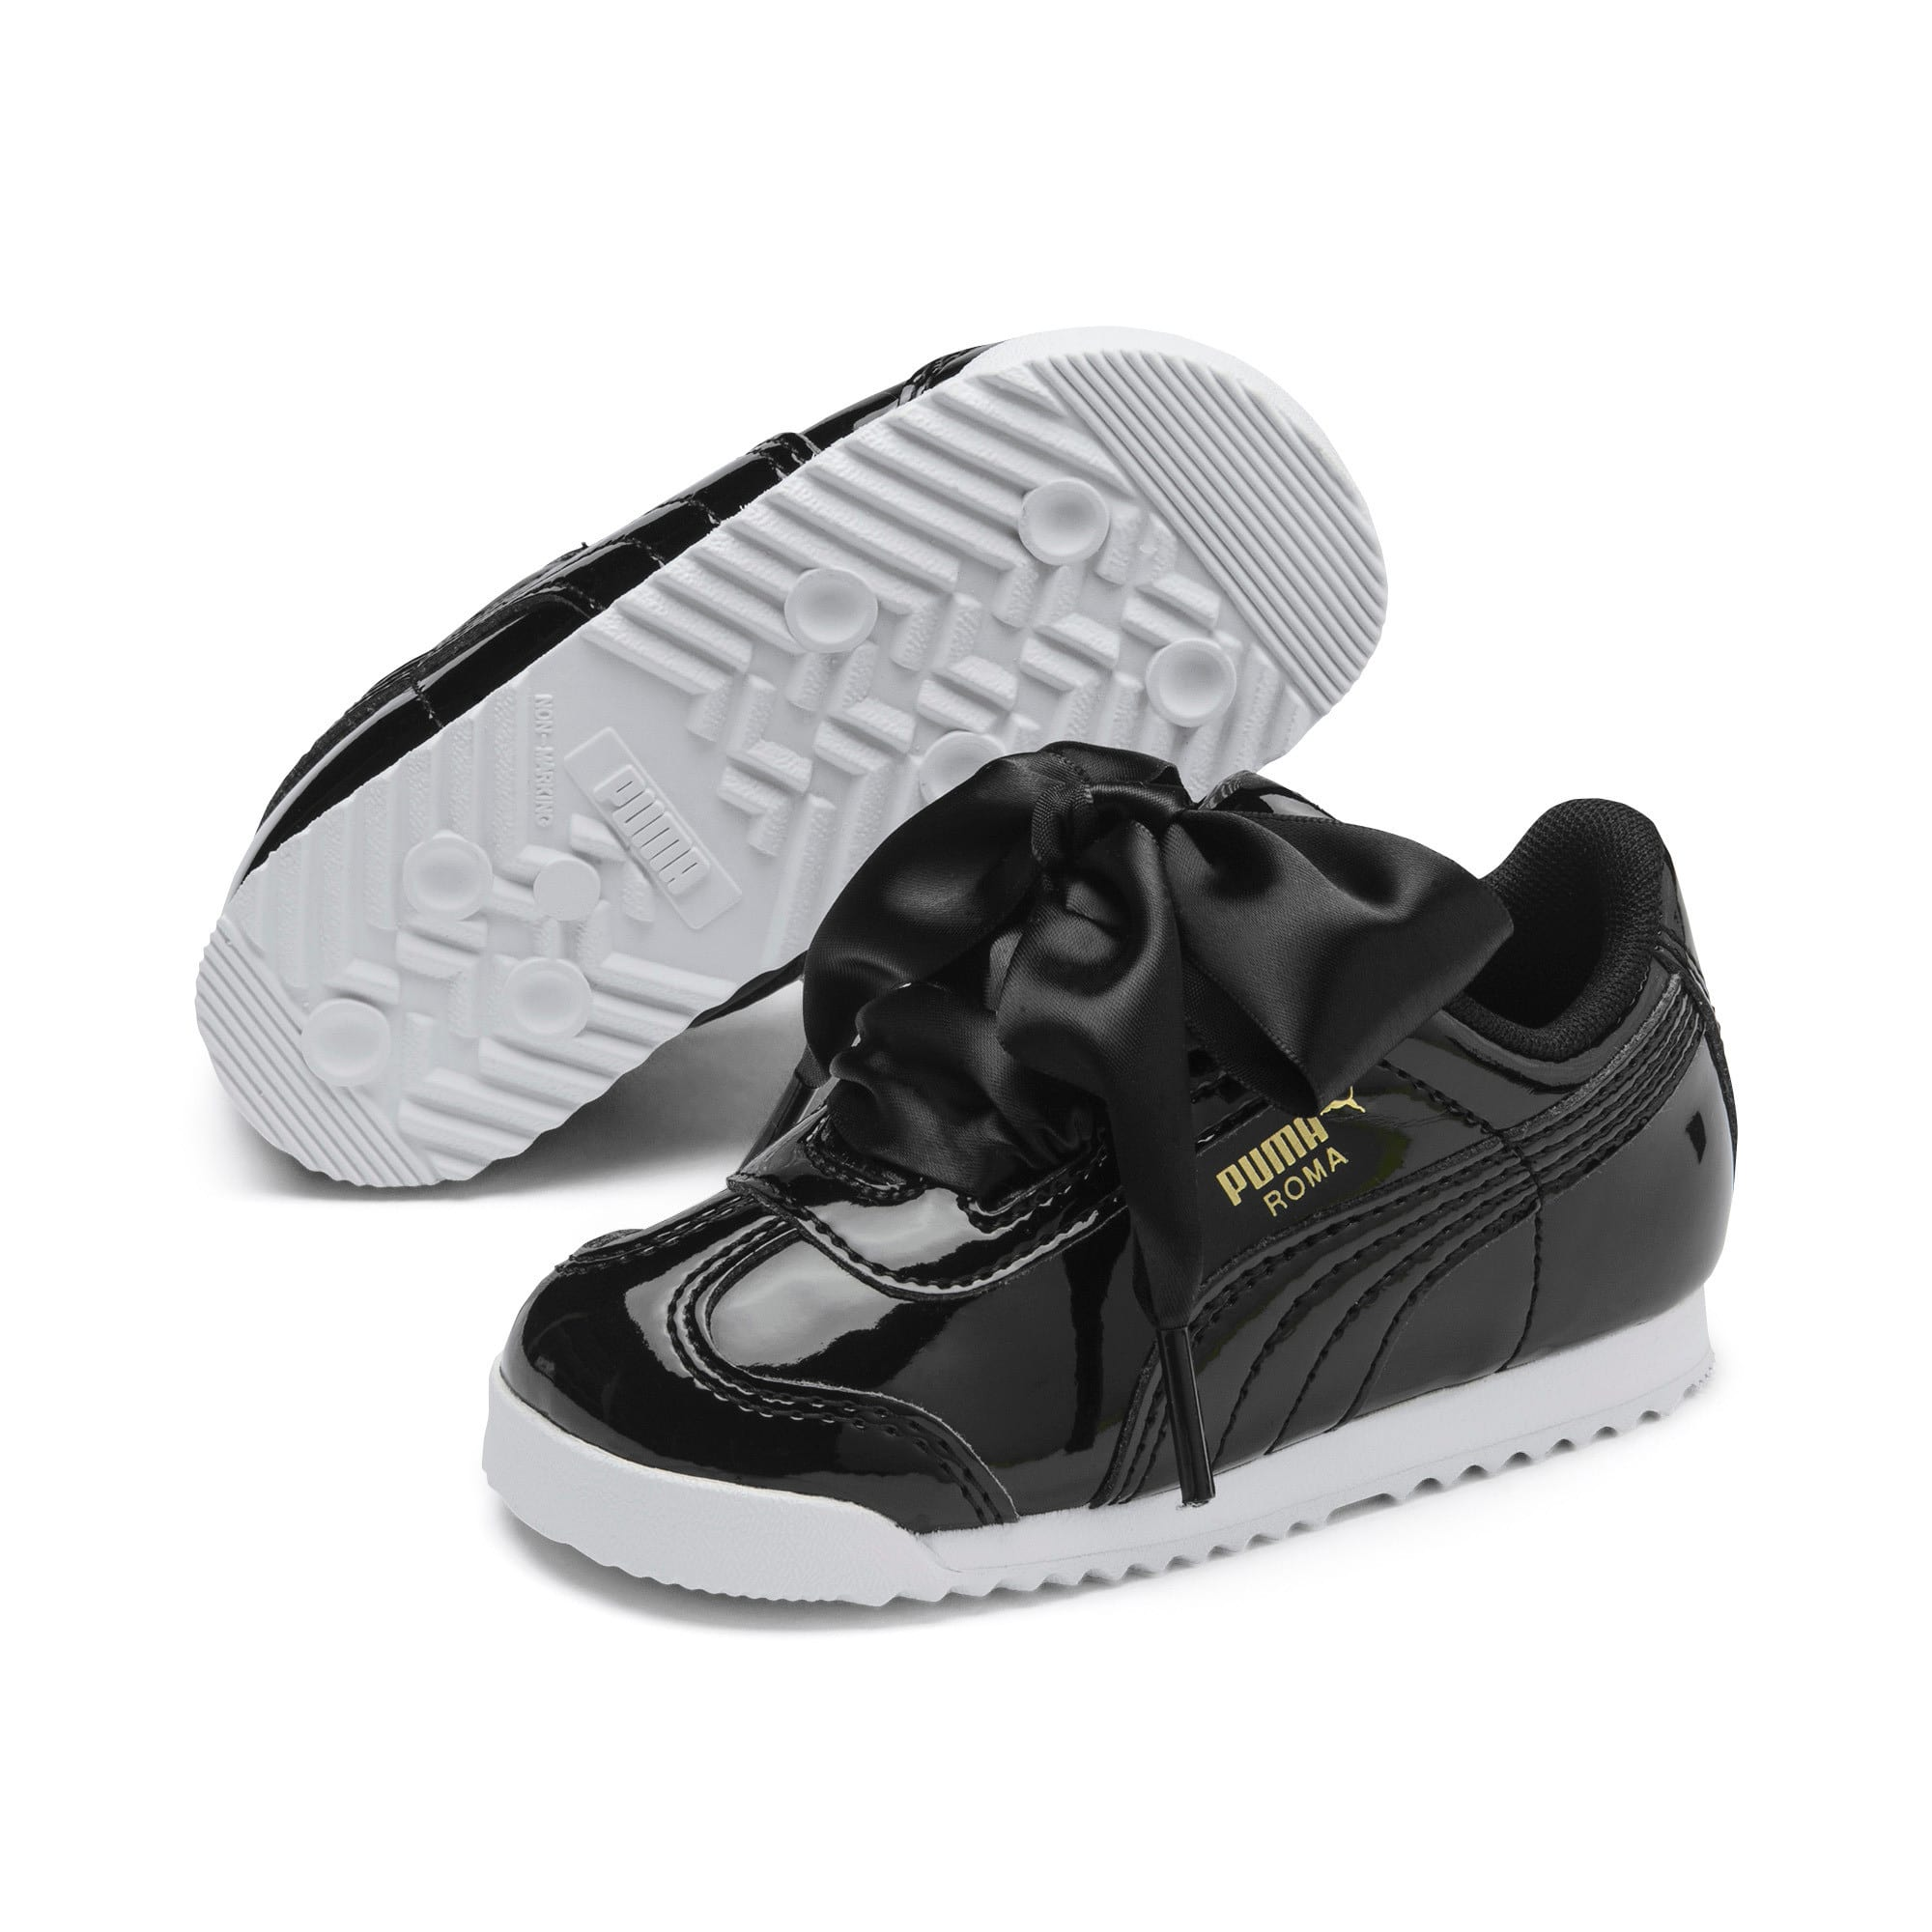 Thumbnail 2 of Roma Heart Patent Toddler Shoes, Puma Black, medium